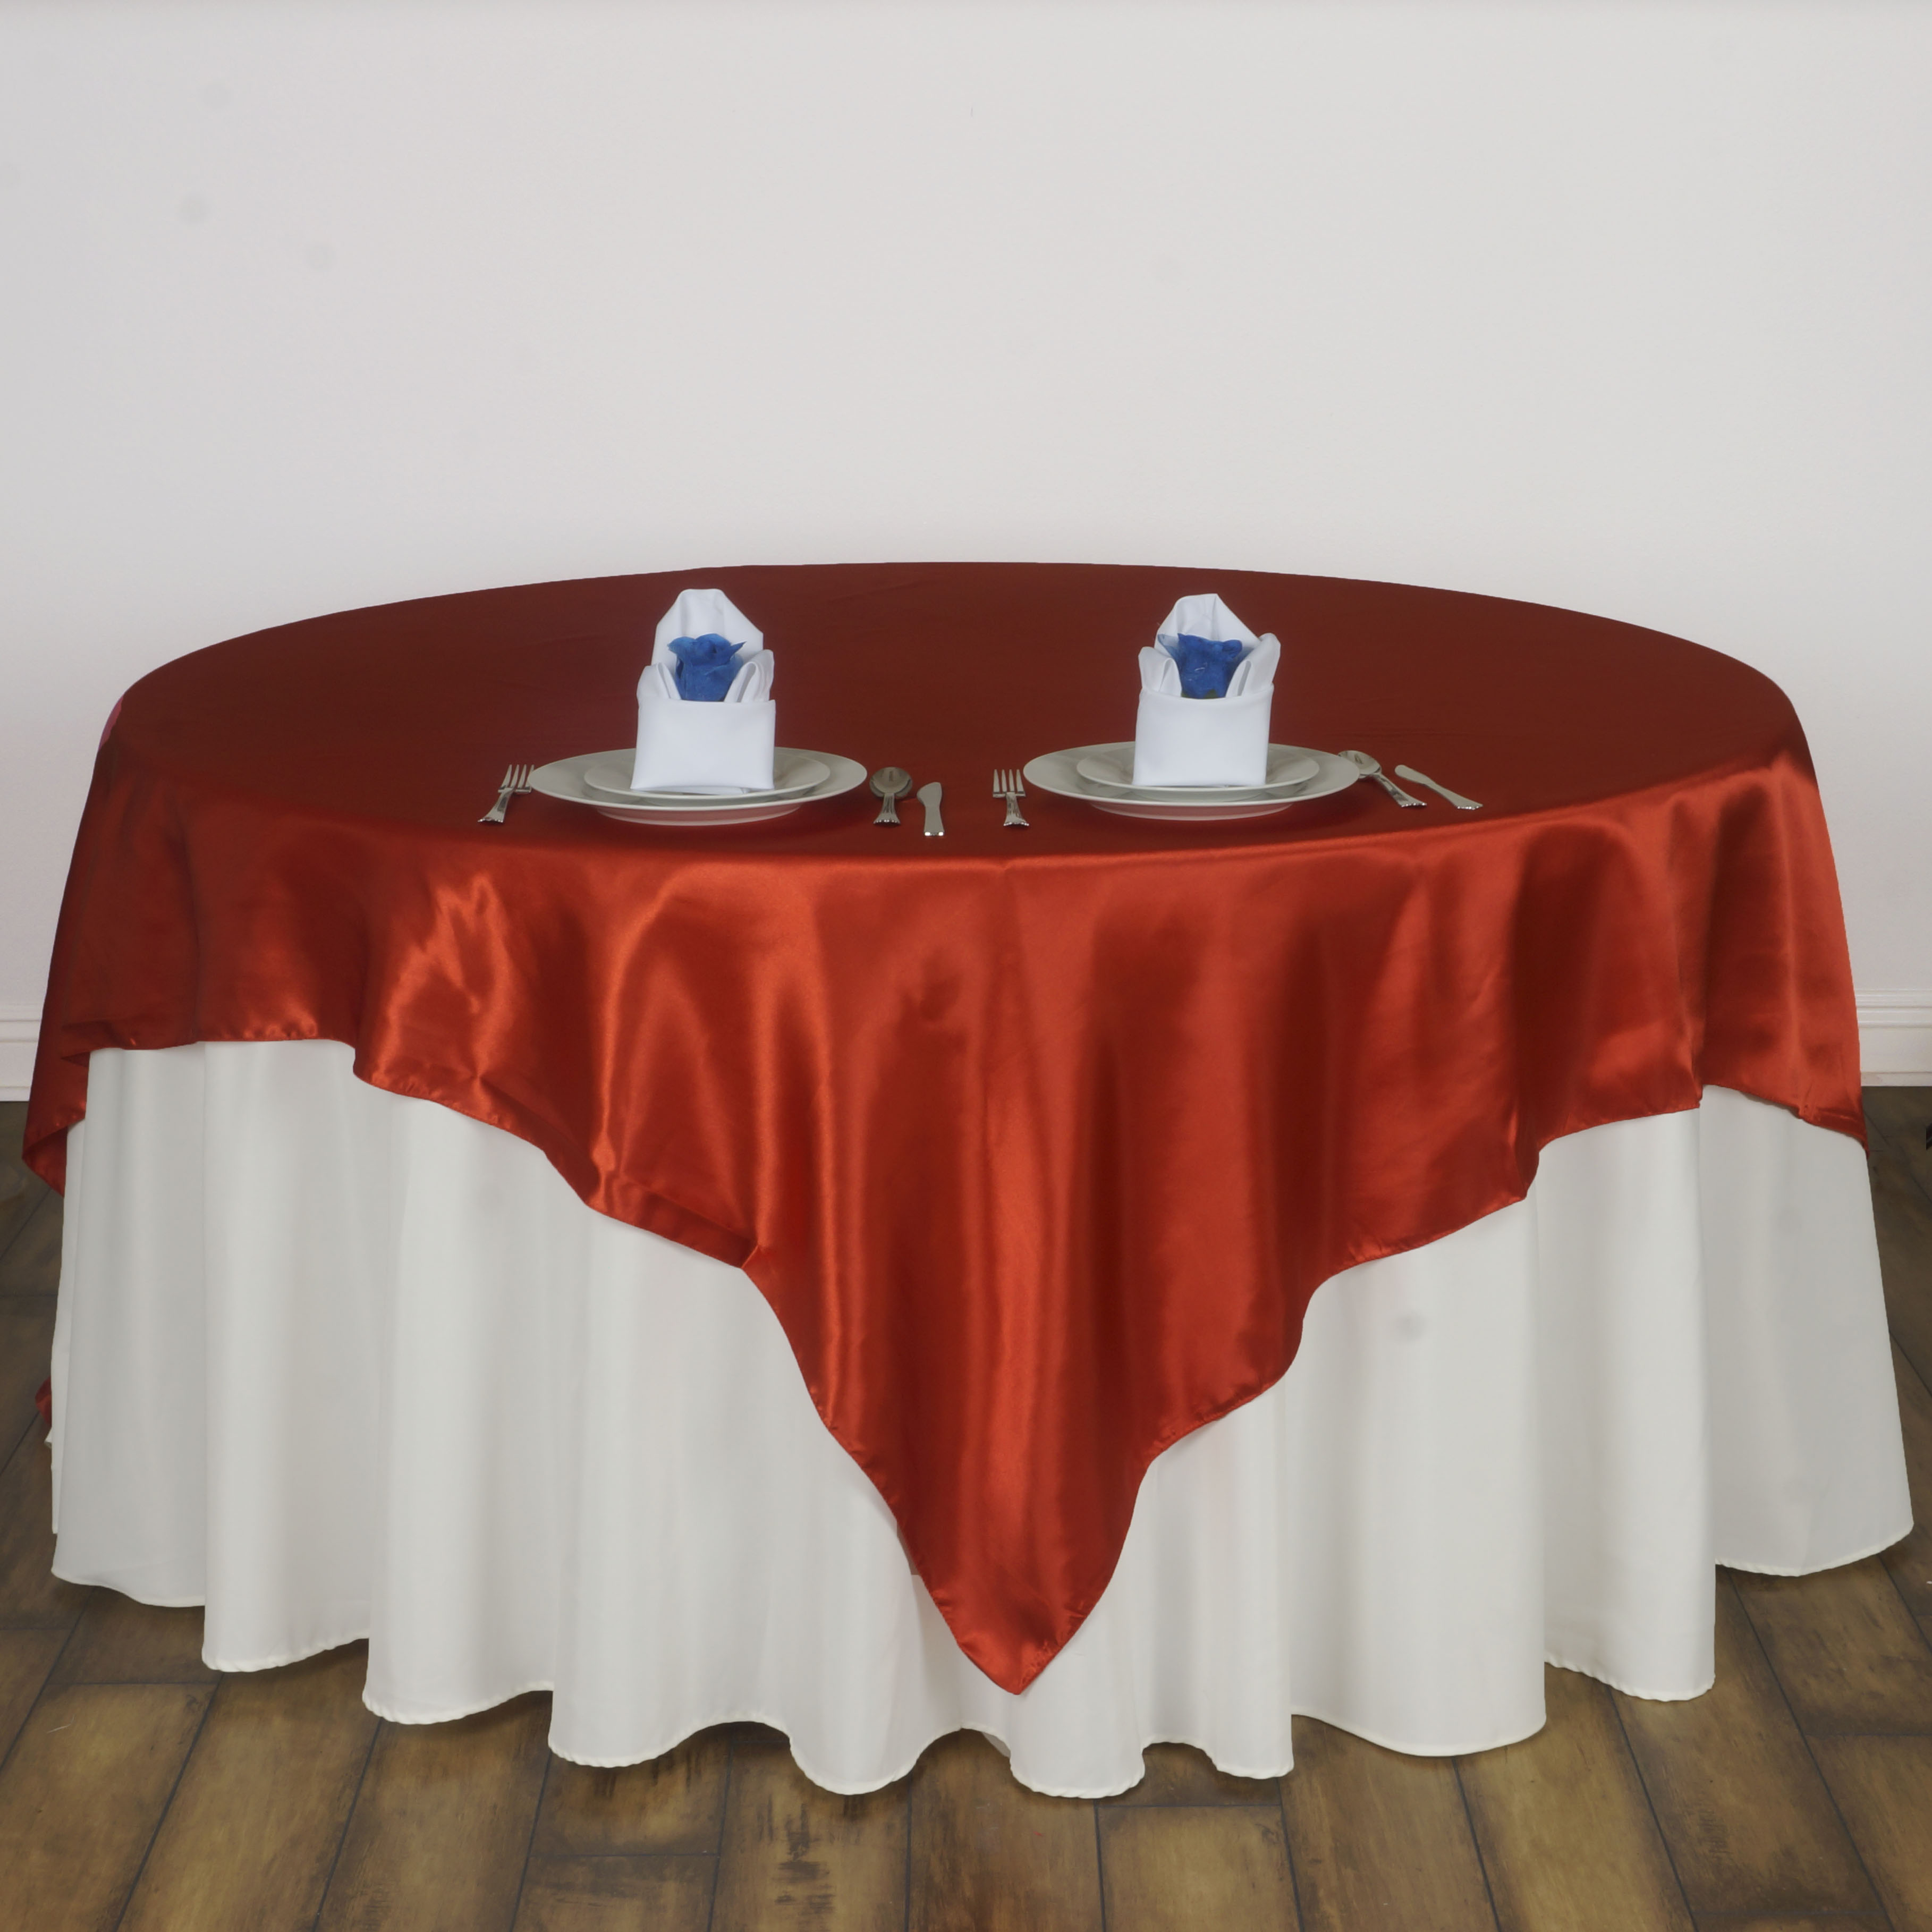 "15 Pcs 72x72"" Square Satin Table Overlays Wedding Linens. Rooms To Go Desks. Kitchen Cabinet Drawer Pulls. White Chair For Desk. Golden Ratio Massage Table. Mini Fridge For Desk. Desk Solid Wood. 8 Foot Slate Pool Table. Building Computer Desk"